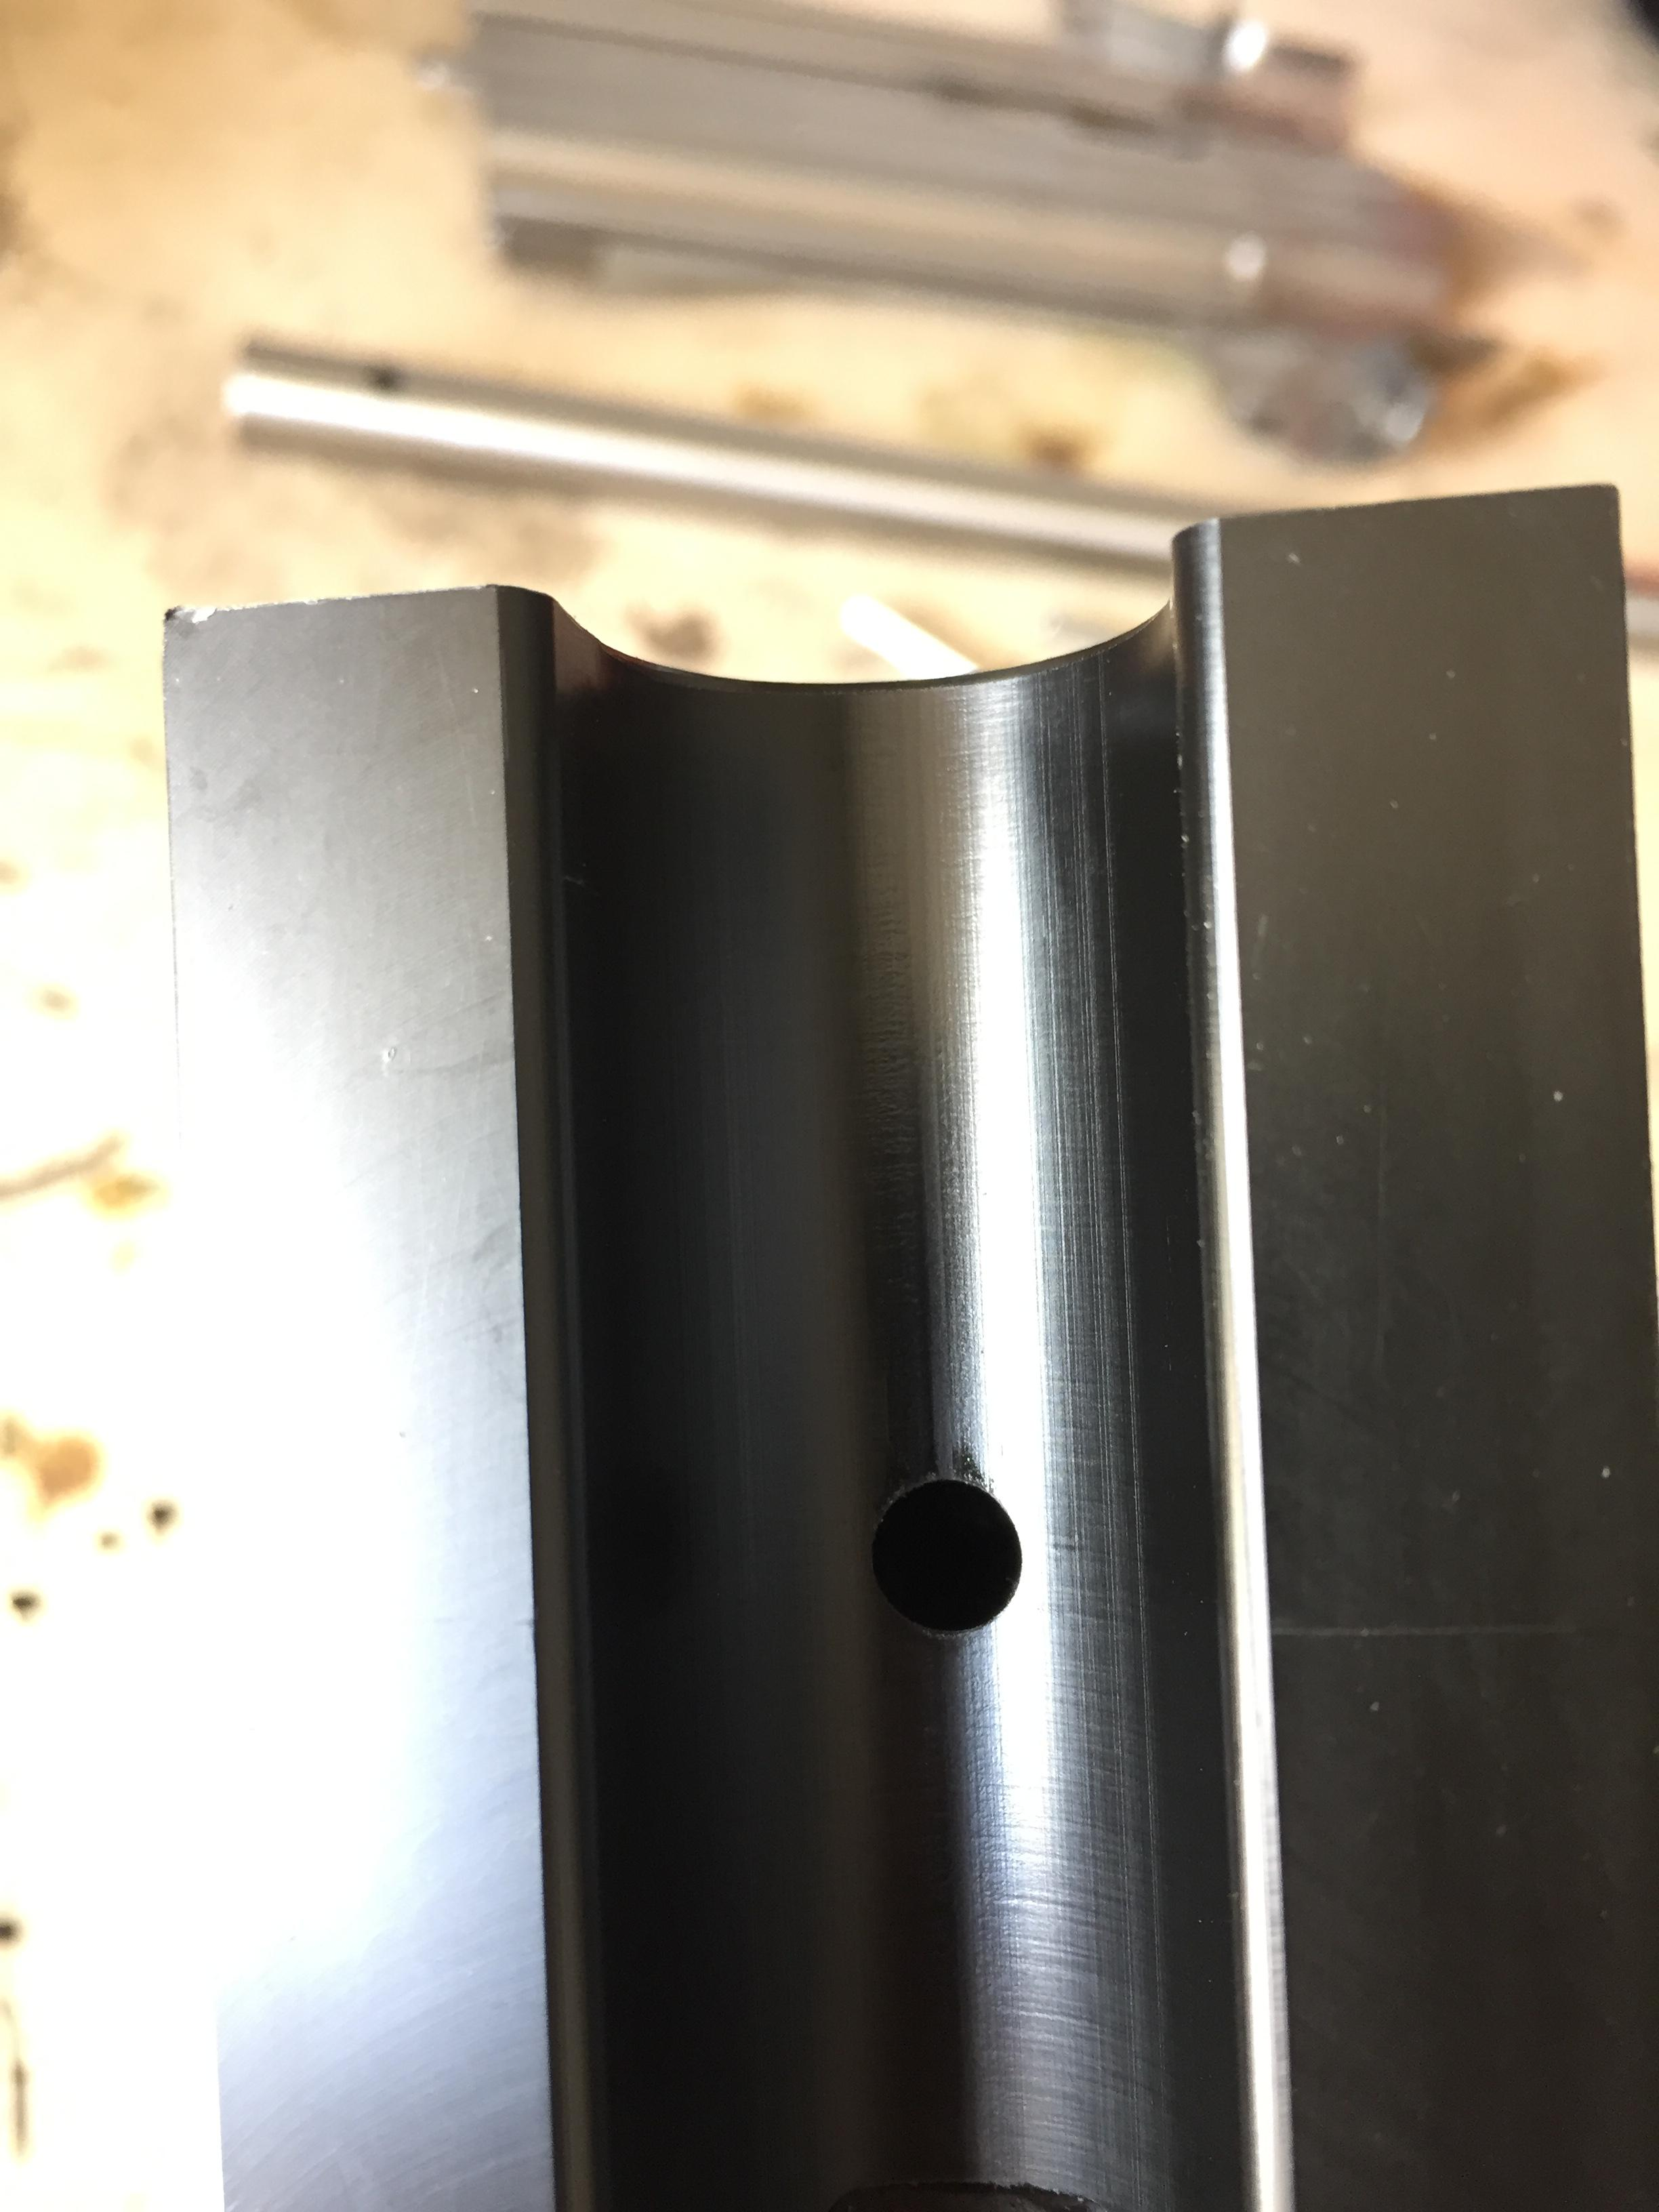 My bending jig-2a673266-c20d-4915-a9c3-e2a243c27cb2_1522538499377.jpeg